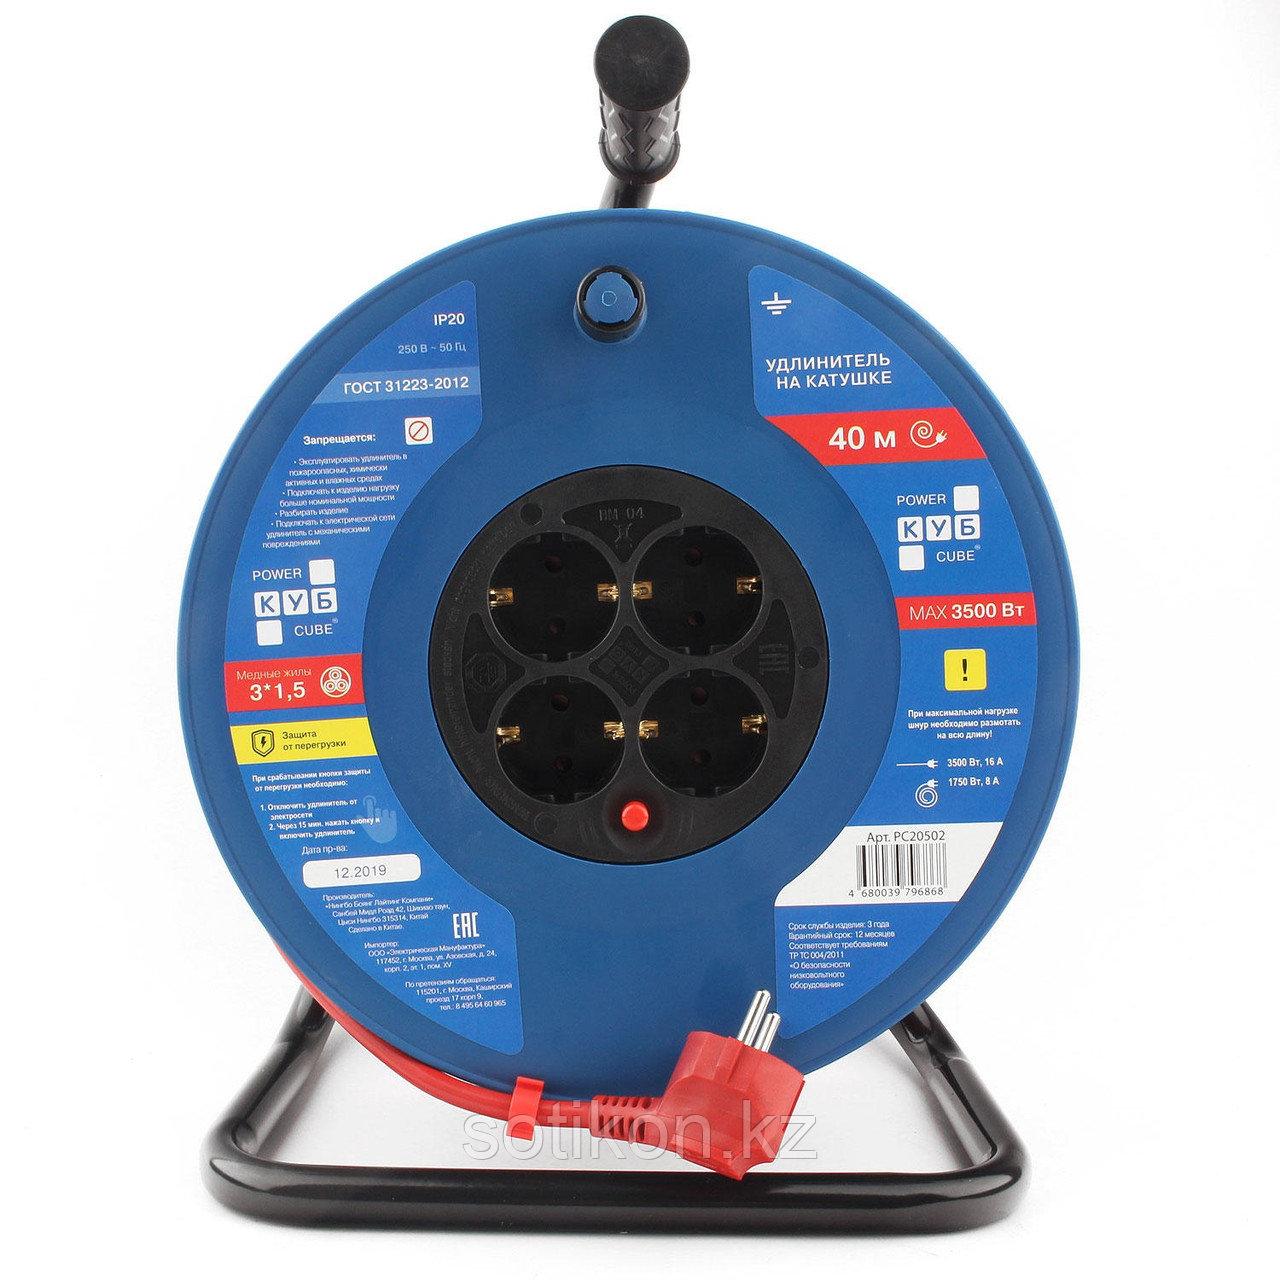 Силовой удлинитель на катушке Power Cube PC-BG4-K-40, 16 А/3,5 кВт,40 м, 4 розетки с/з, красно-синий